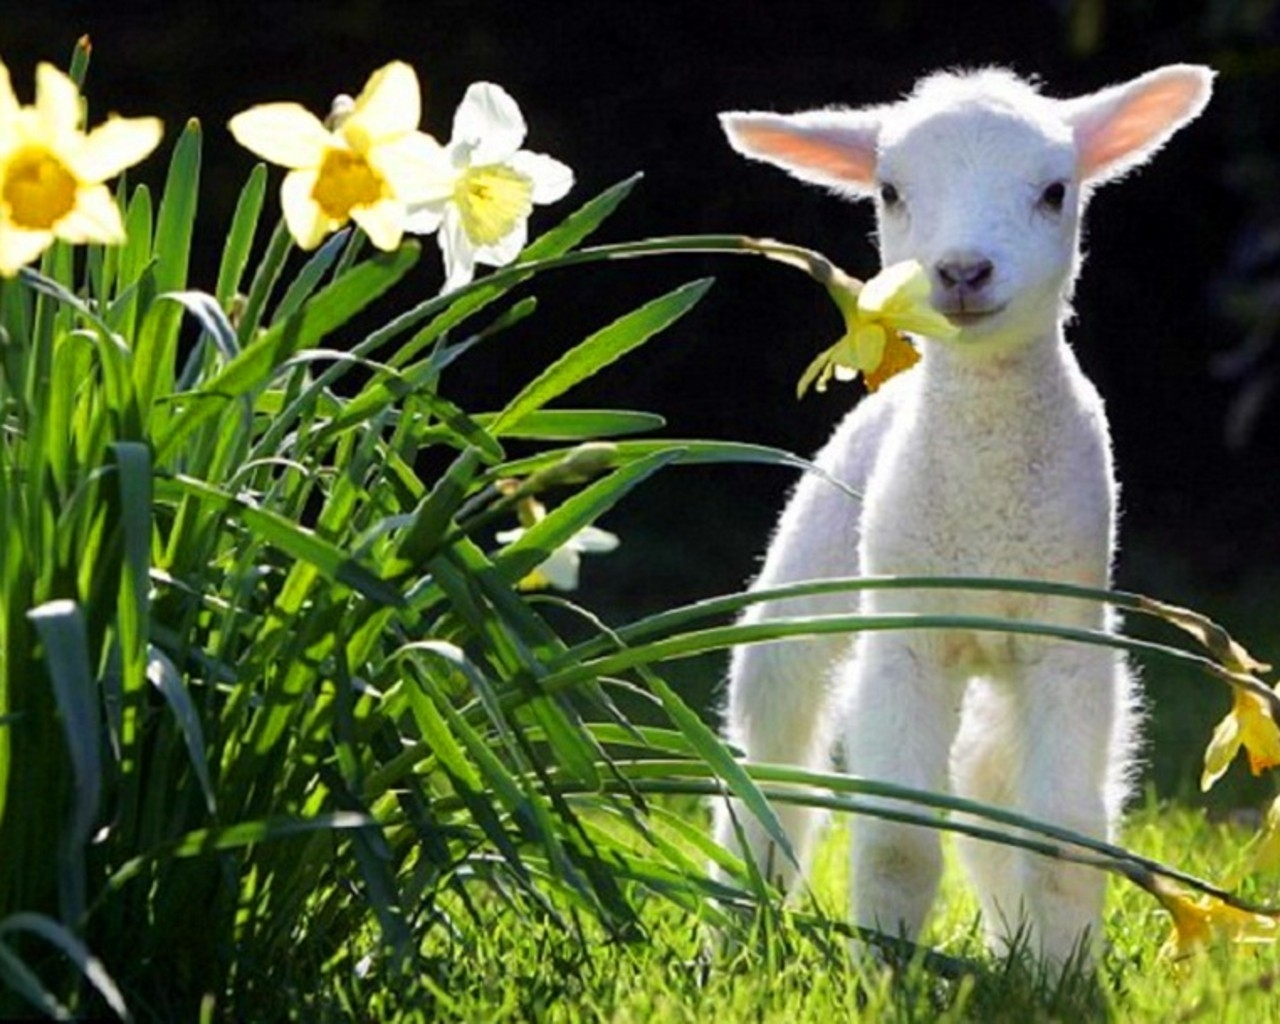 animals grass spring lamb daffodils lambs white flowers baby animals 1280x1024